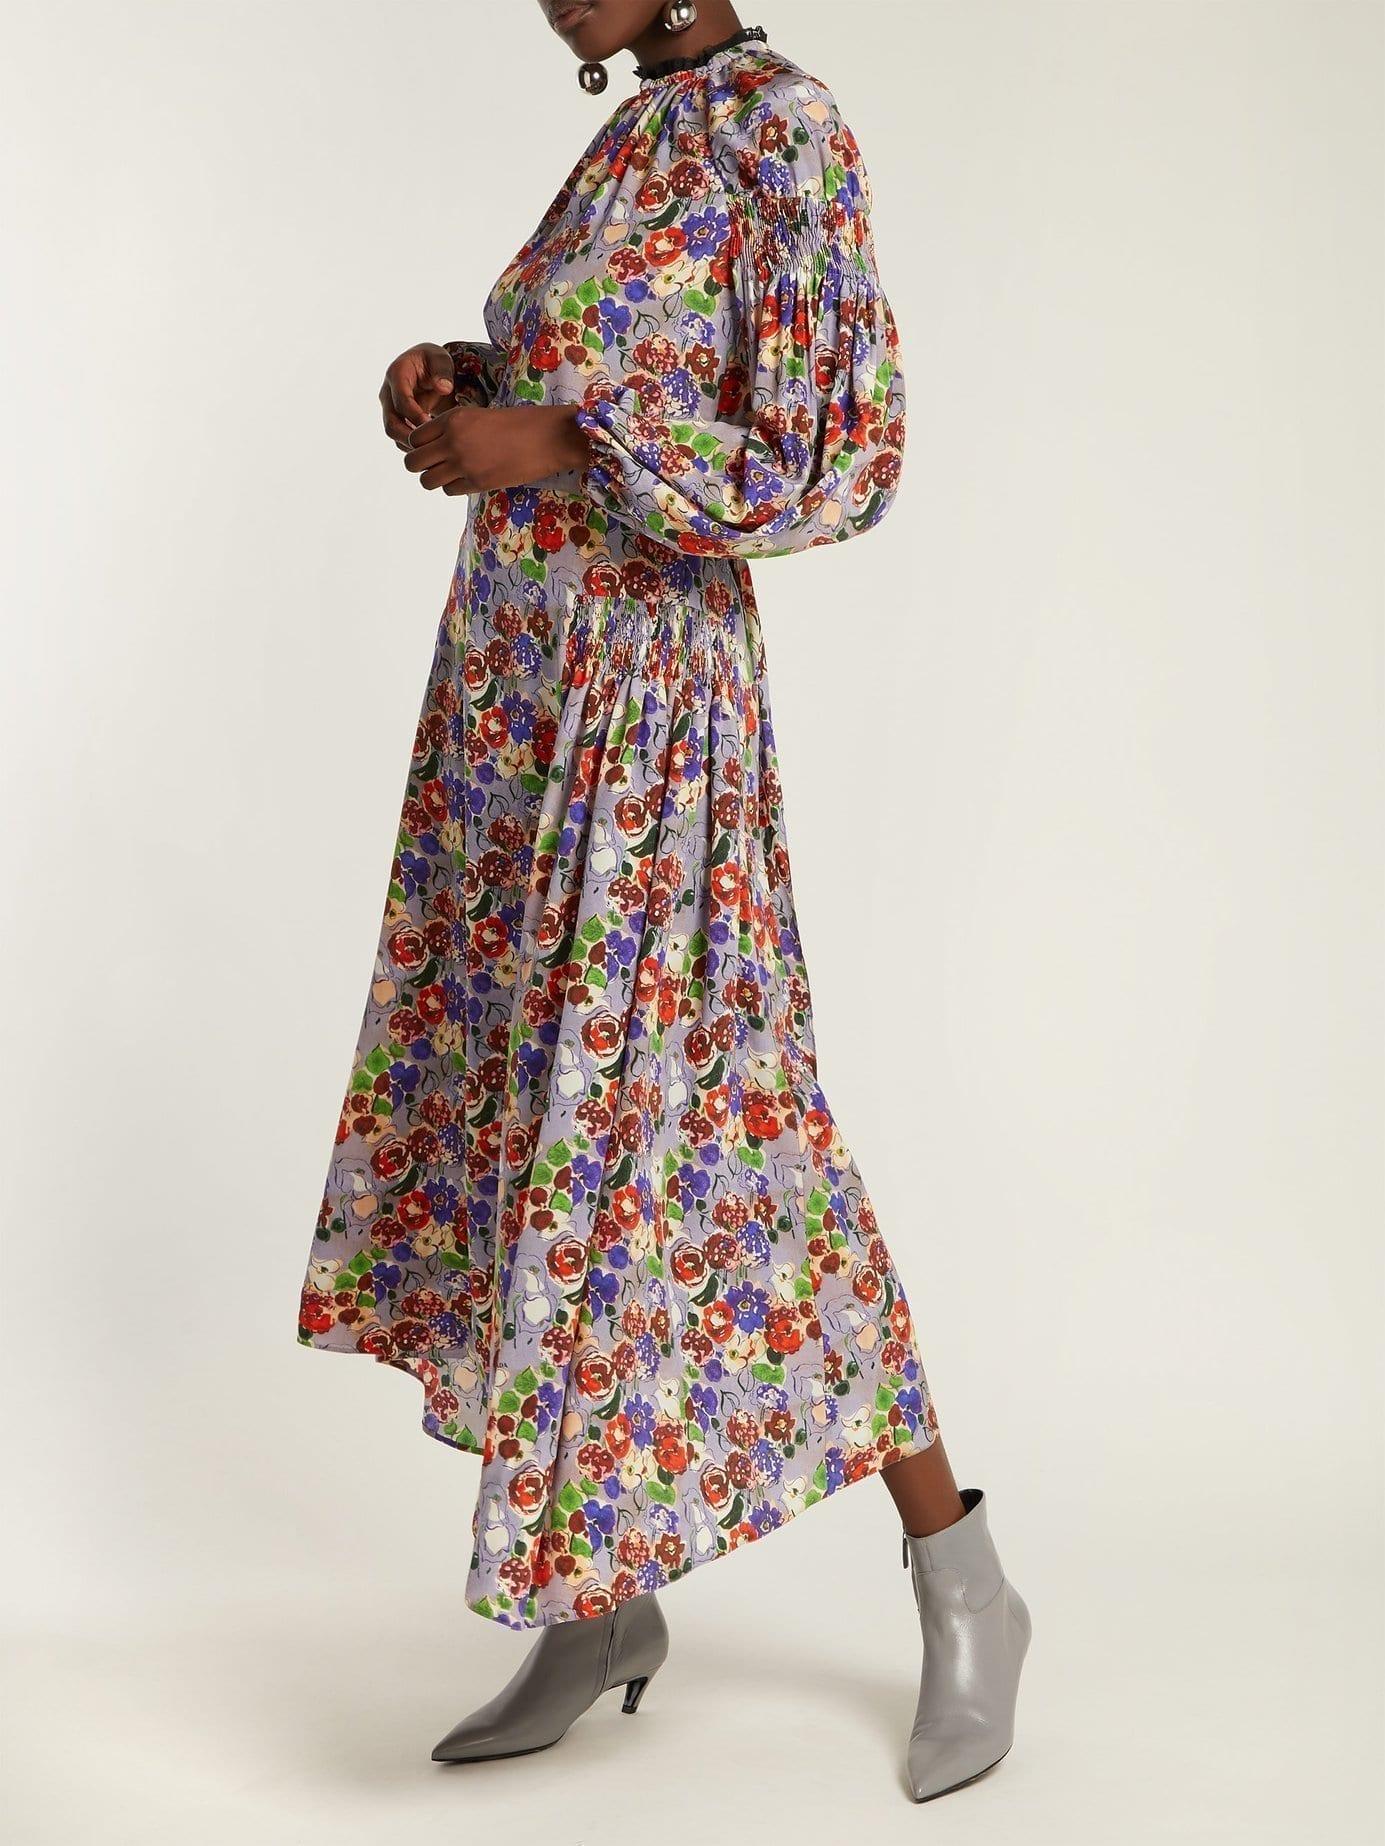 PRADA Morocaine Primrose Silk Multi / Floral Printed Dress